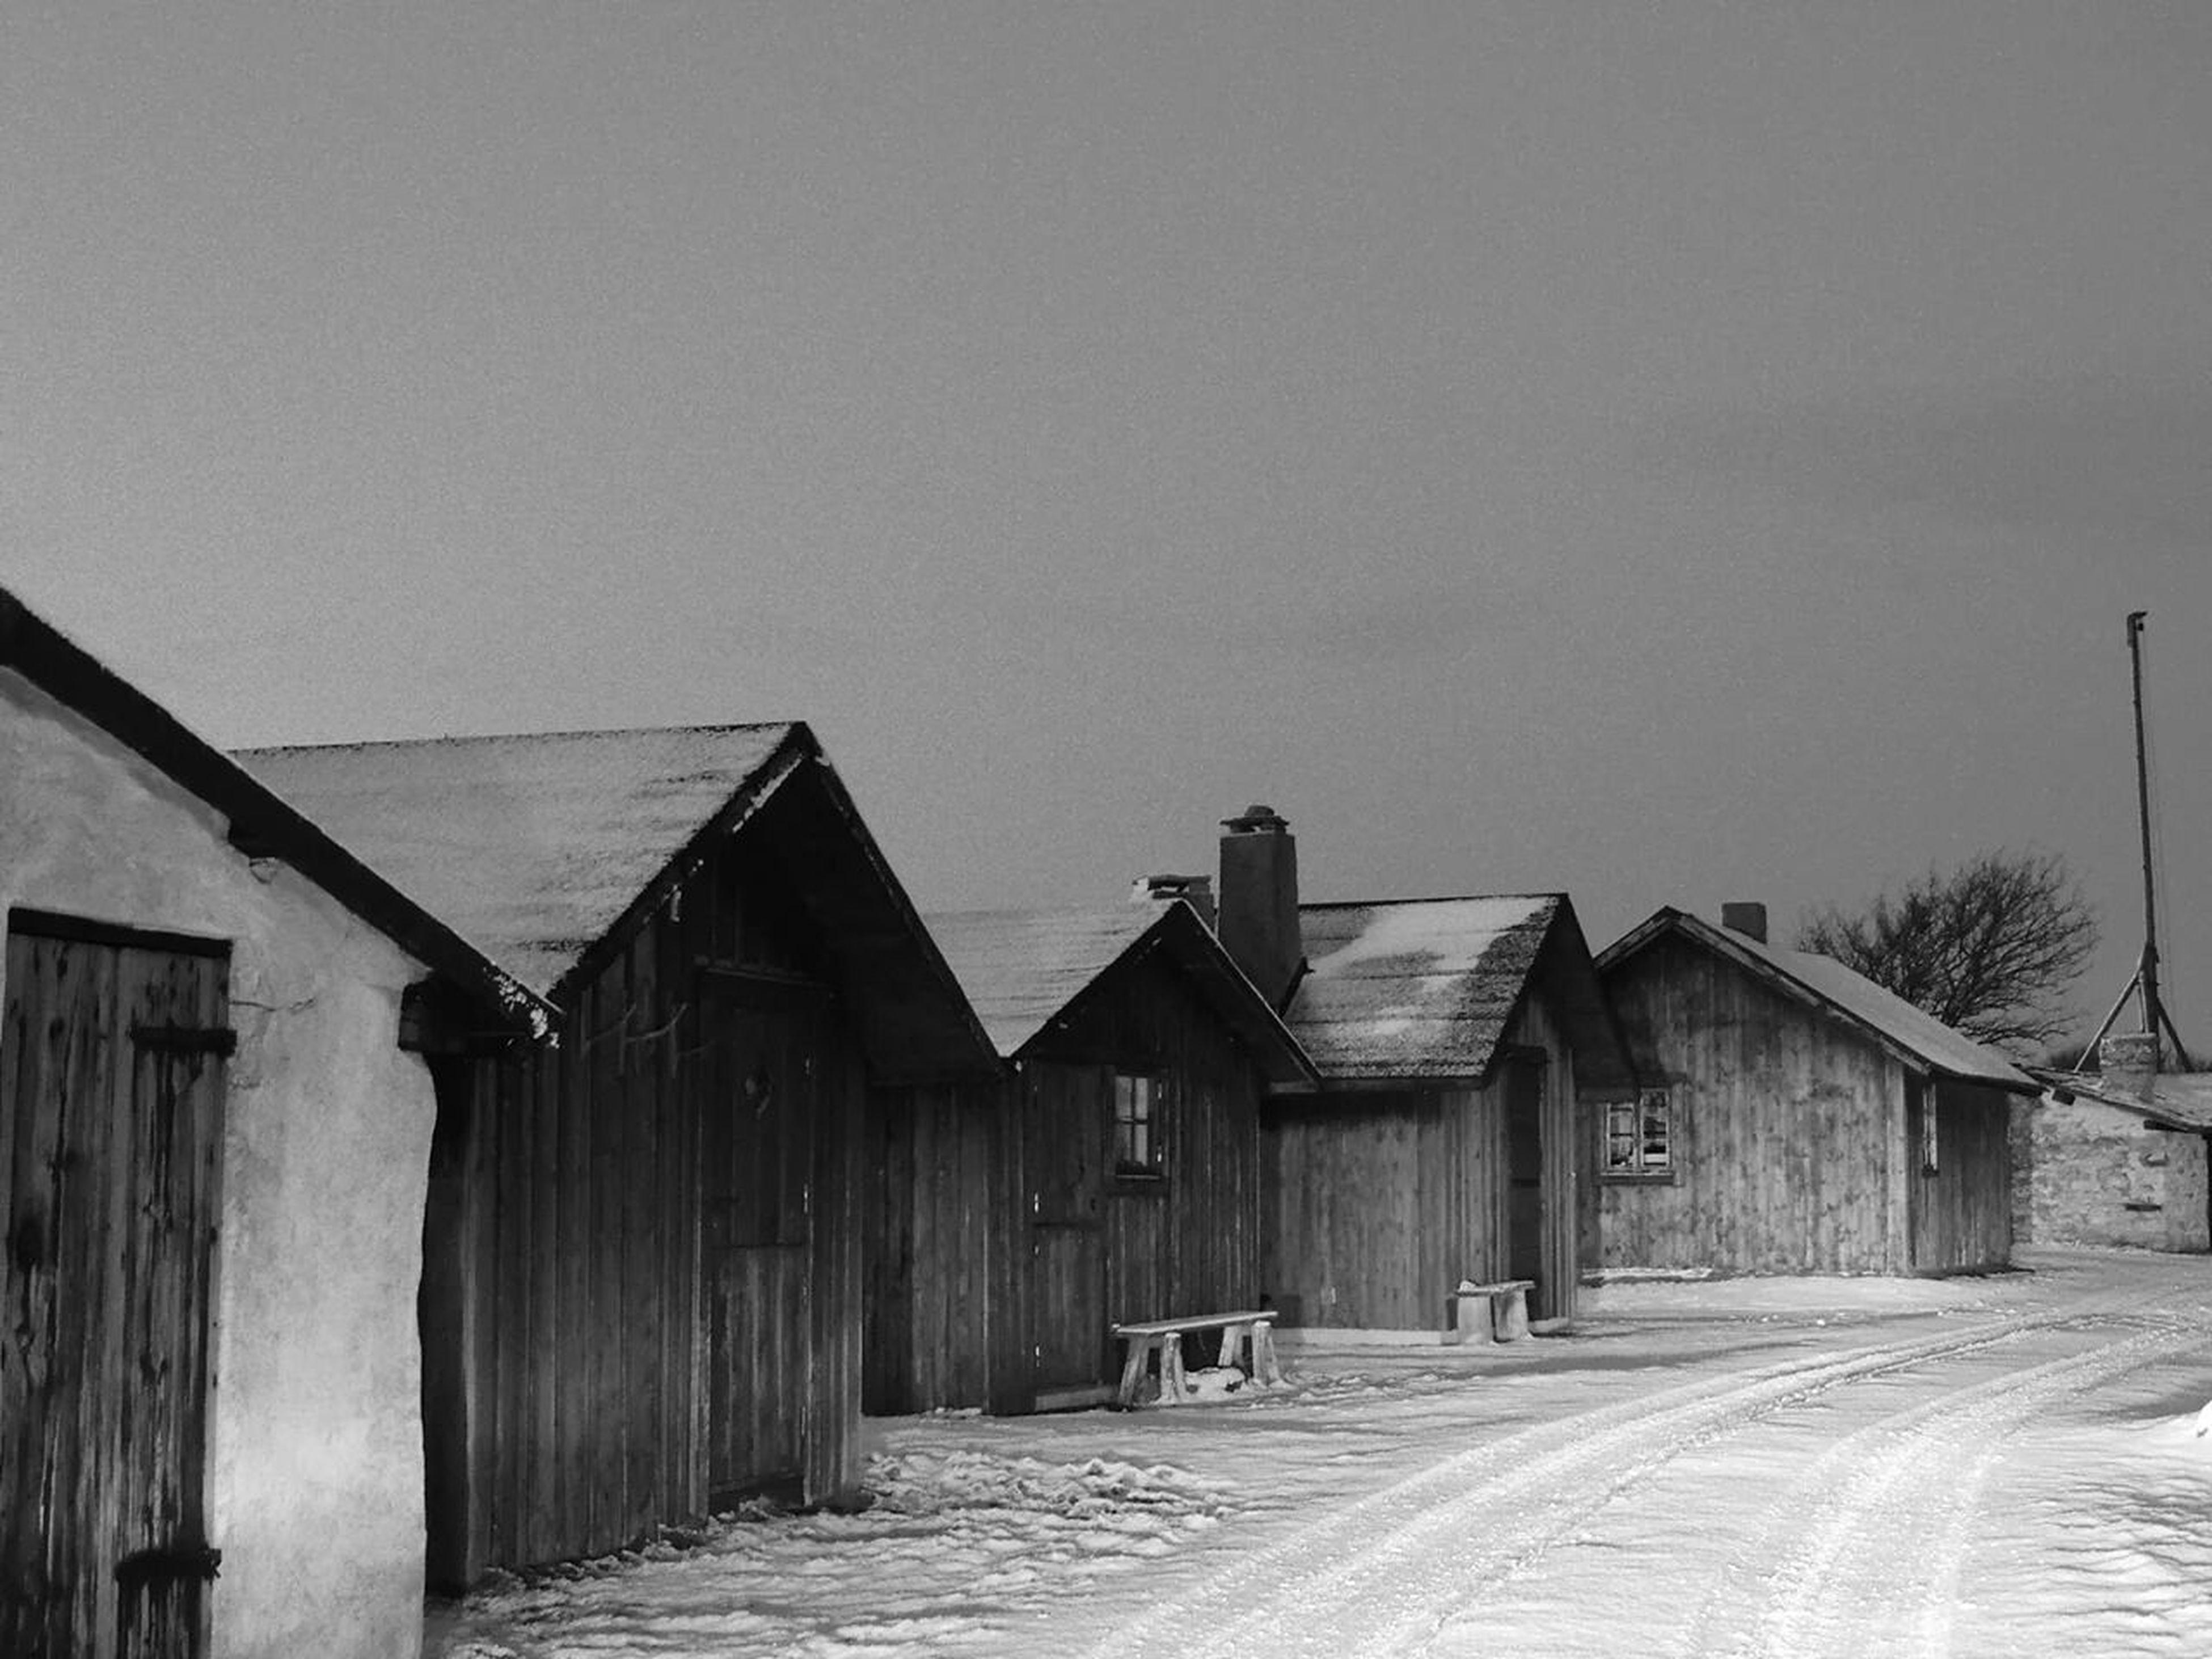 Nikonp510 Tomtbod Gotland